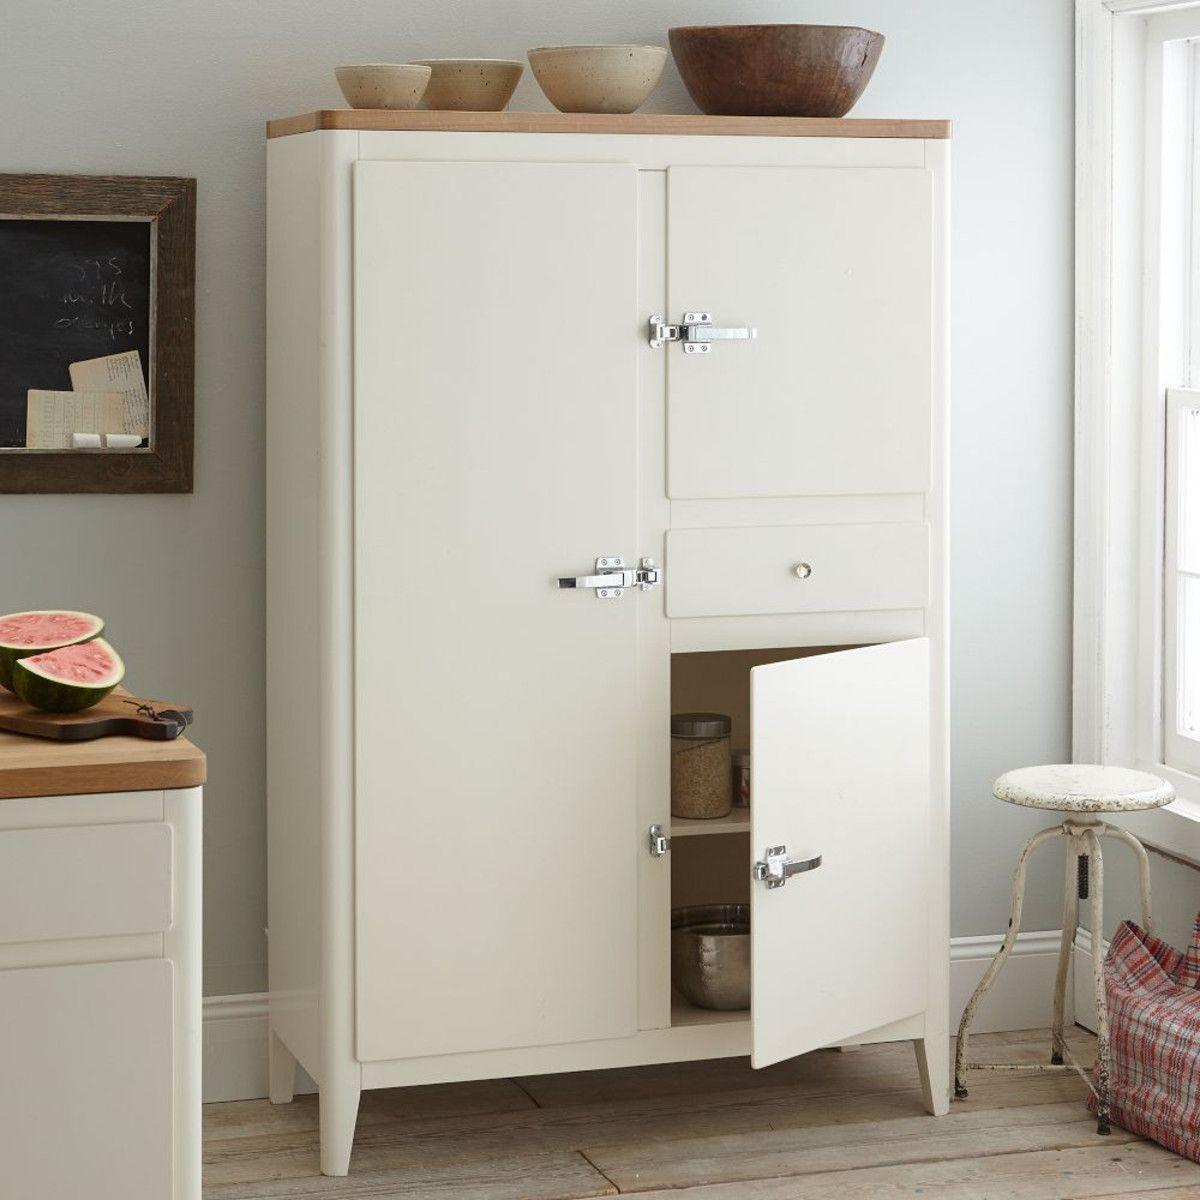 Best Kitchen Gallery: Freestanding Kitchen Unit Freestanding Kitchen Kitchen of Kitchen Armoire Cabinets on cal-ite.com